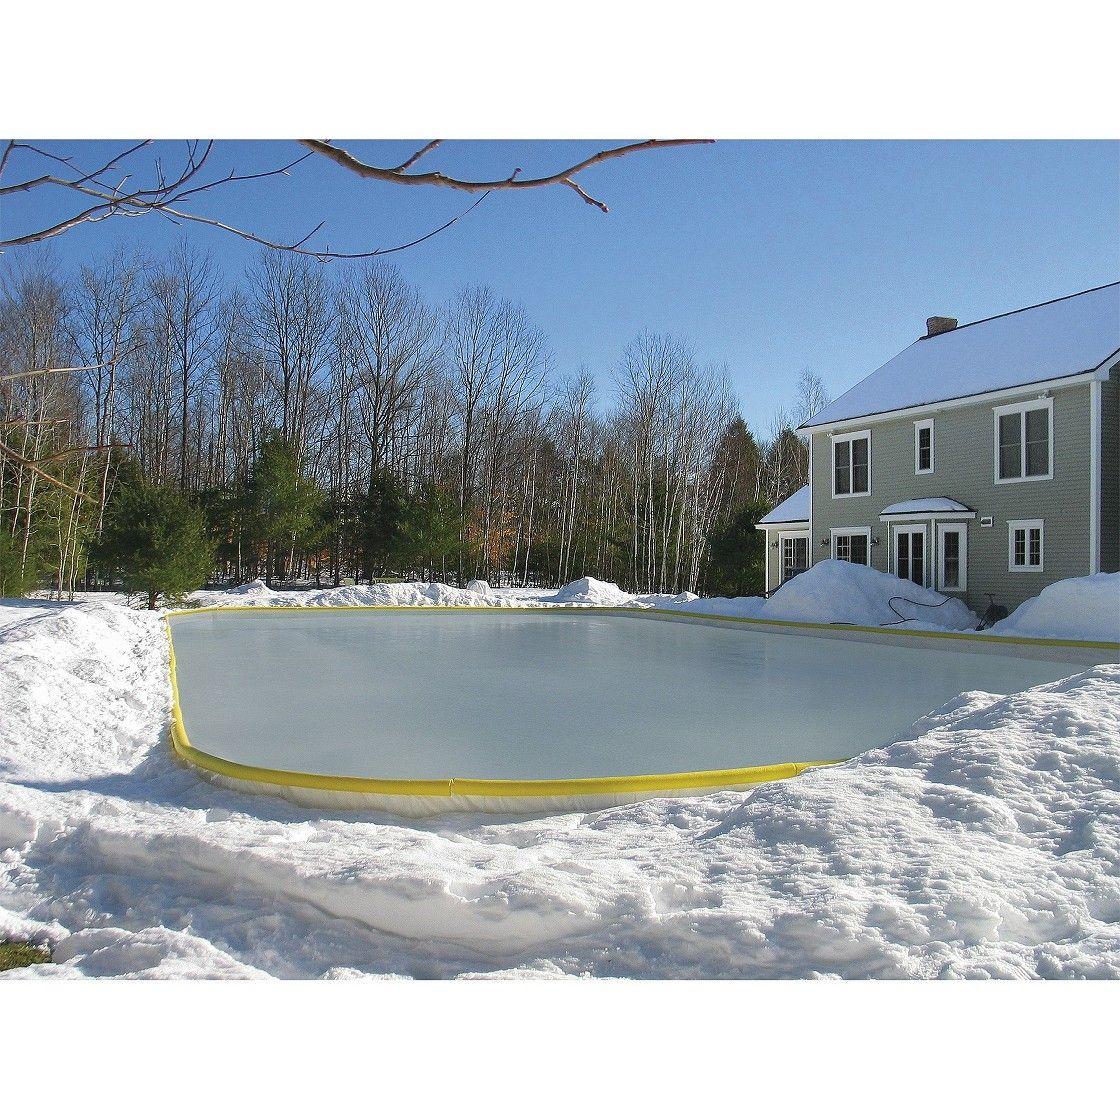 Side Yard Backyard Ice Rink Backyard Rink Ice Rink Backyard ice skating rink kits